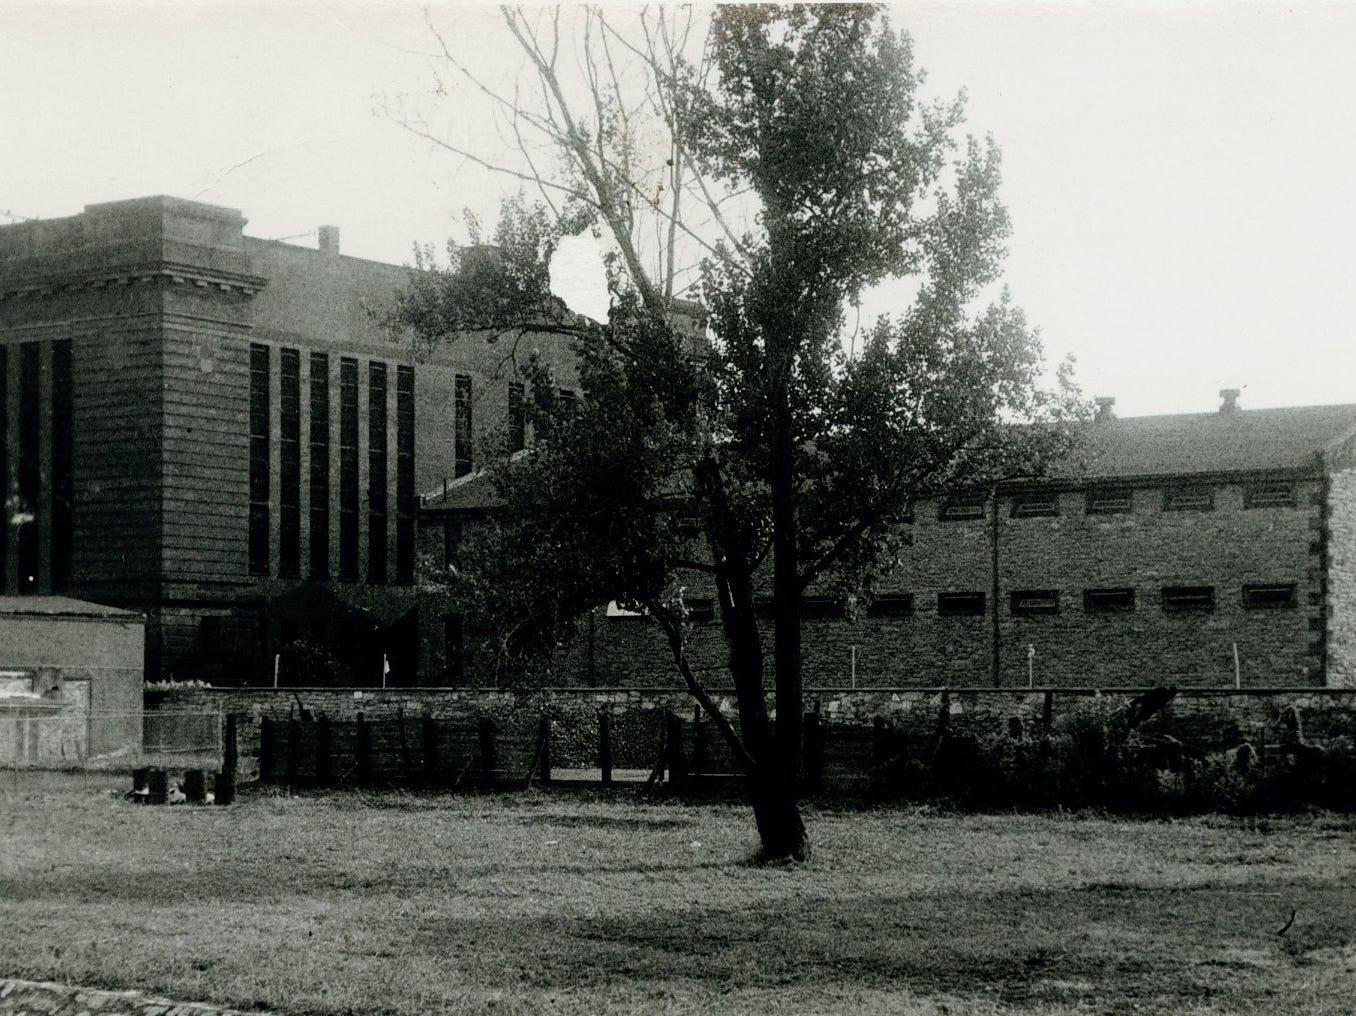 York County Prison 1946. photo courtesy of York County History Center